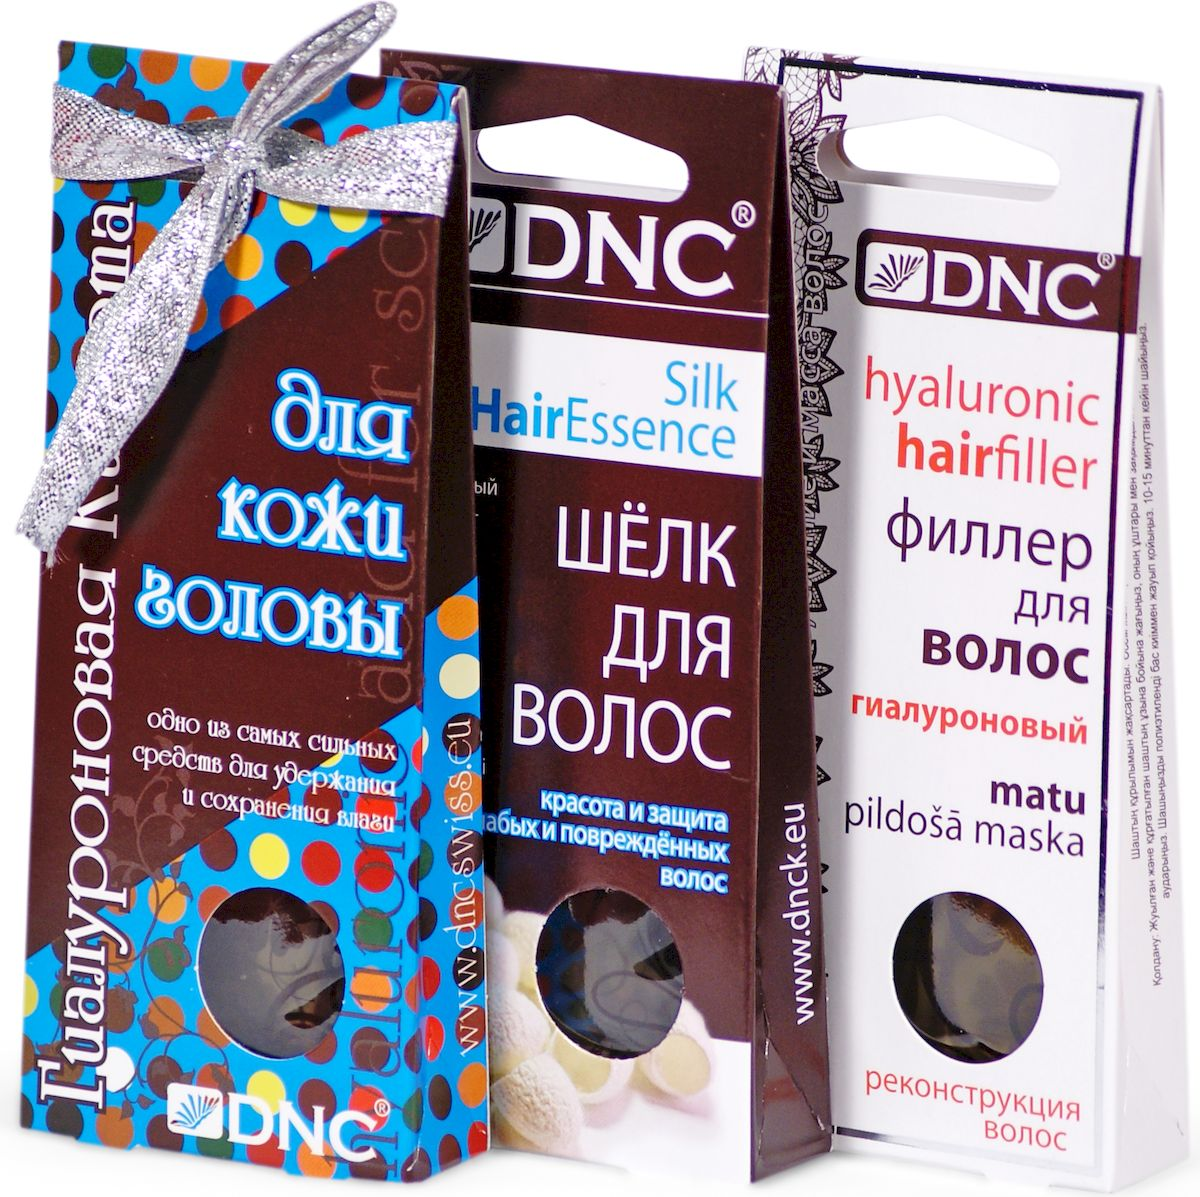 DNC Набор для волос: филлер, 4 х 10 мл, шелк, 4 х 10 мл, гиалуроновая кислота для кожи головы, 3 х 15 мл dnc набор филлер для волос 3 15 мл и шелк для волос 4 10 мл